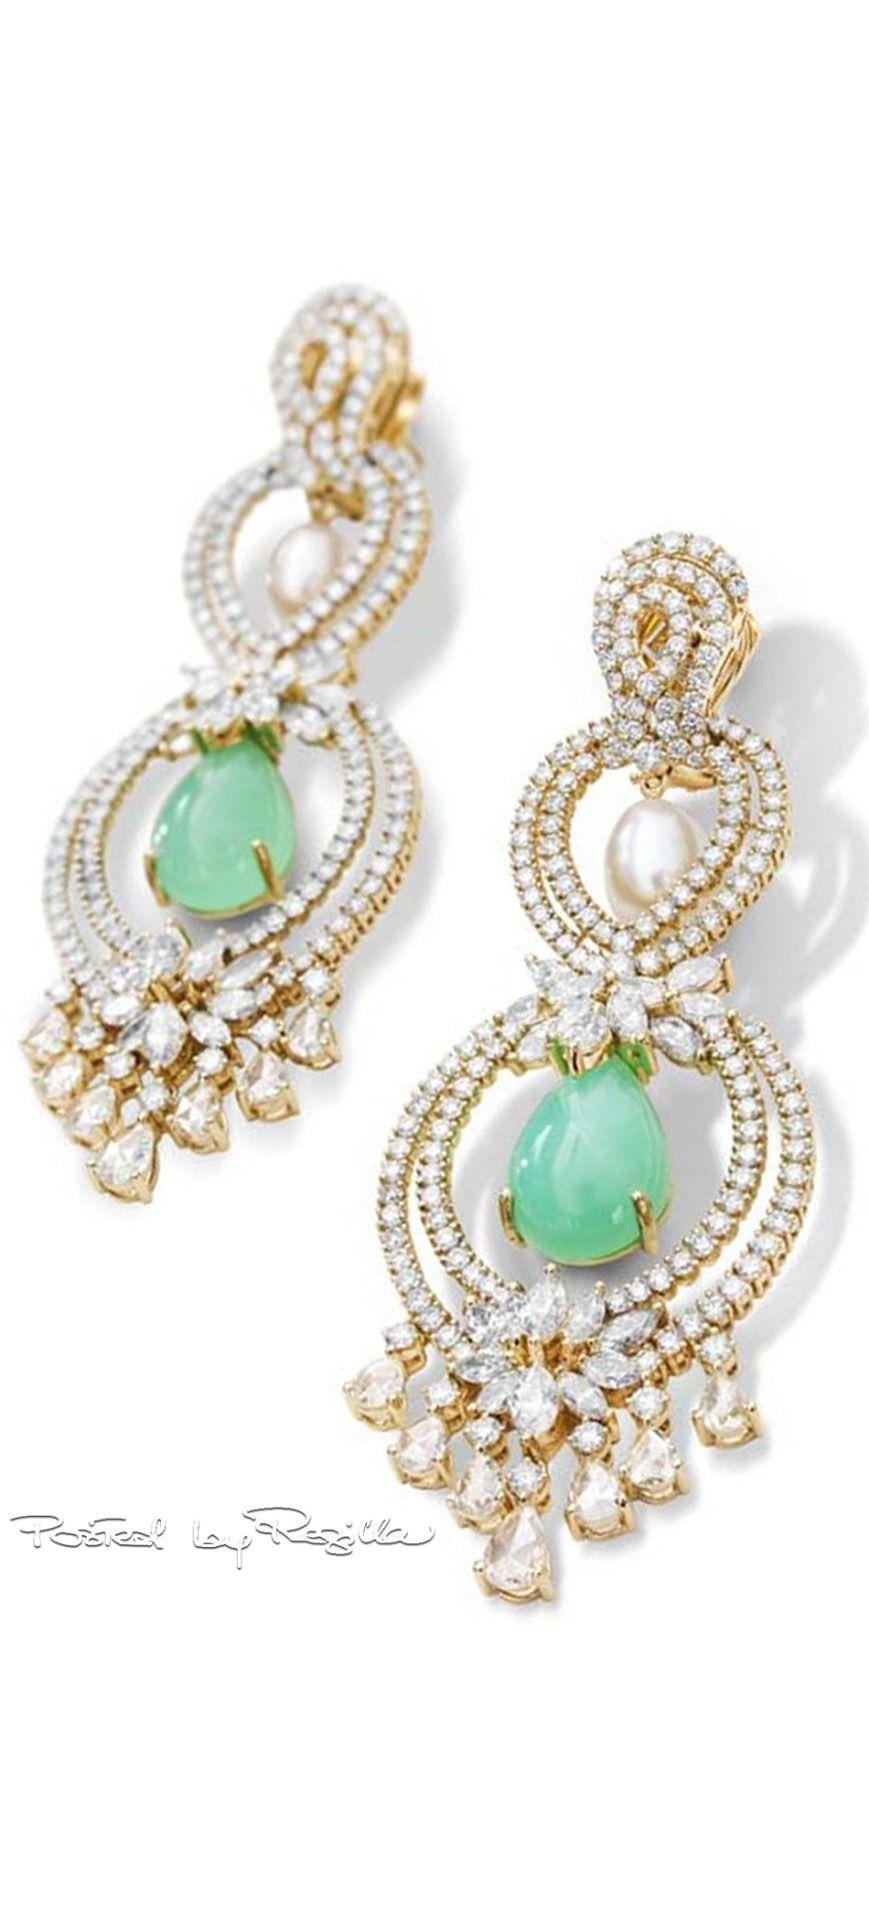 Regilla farah khan high jewelry pinterest gemstone jewel